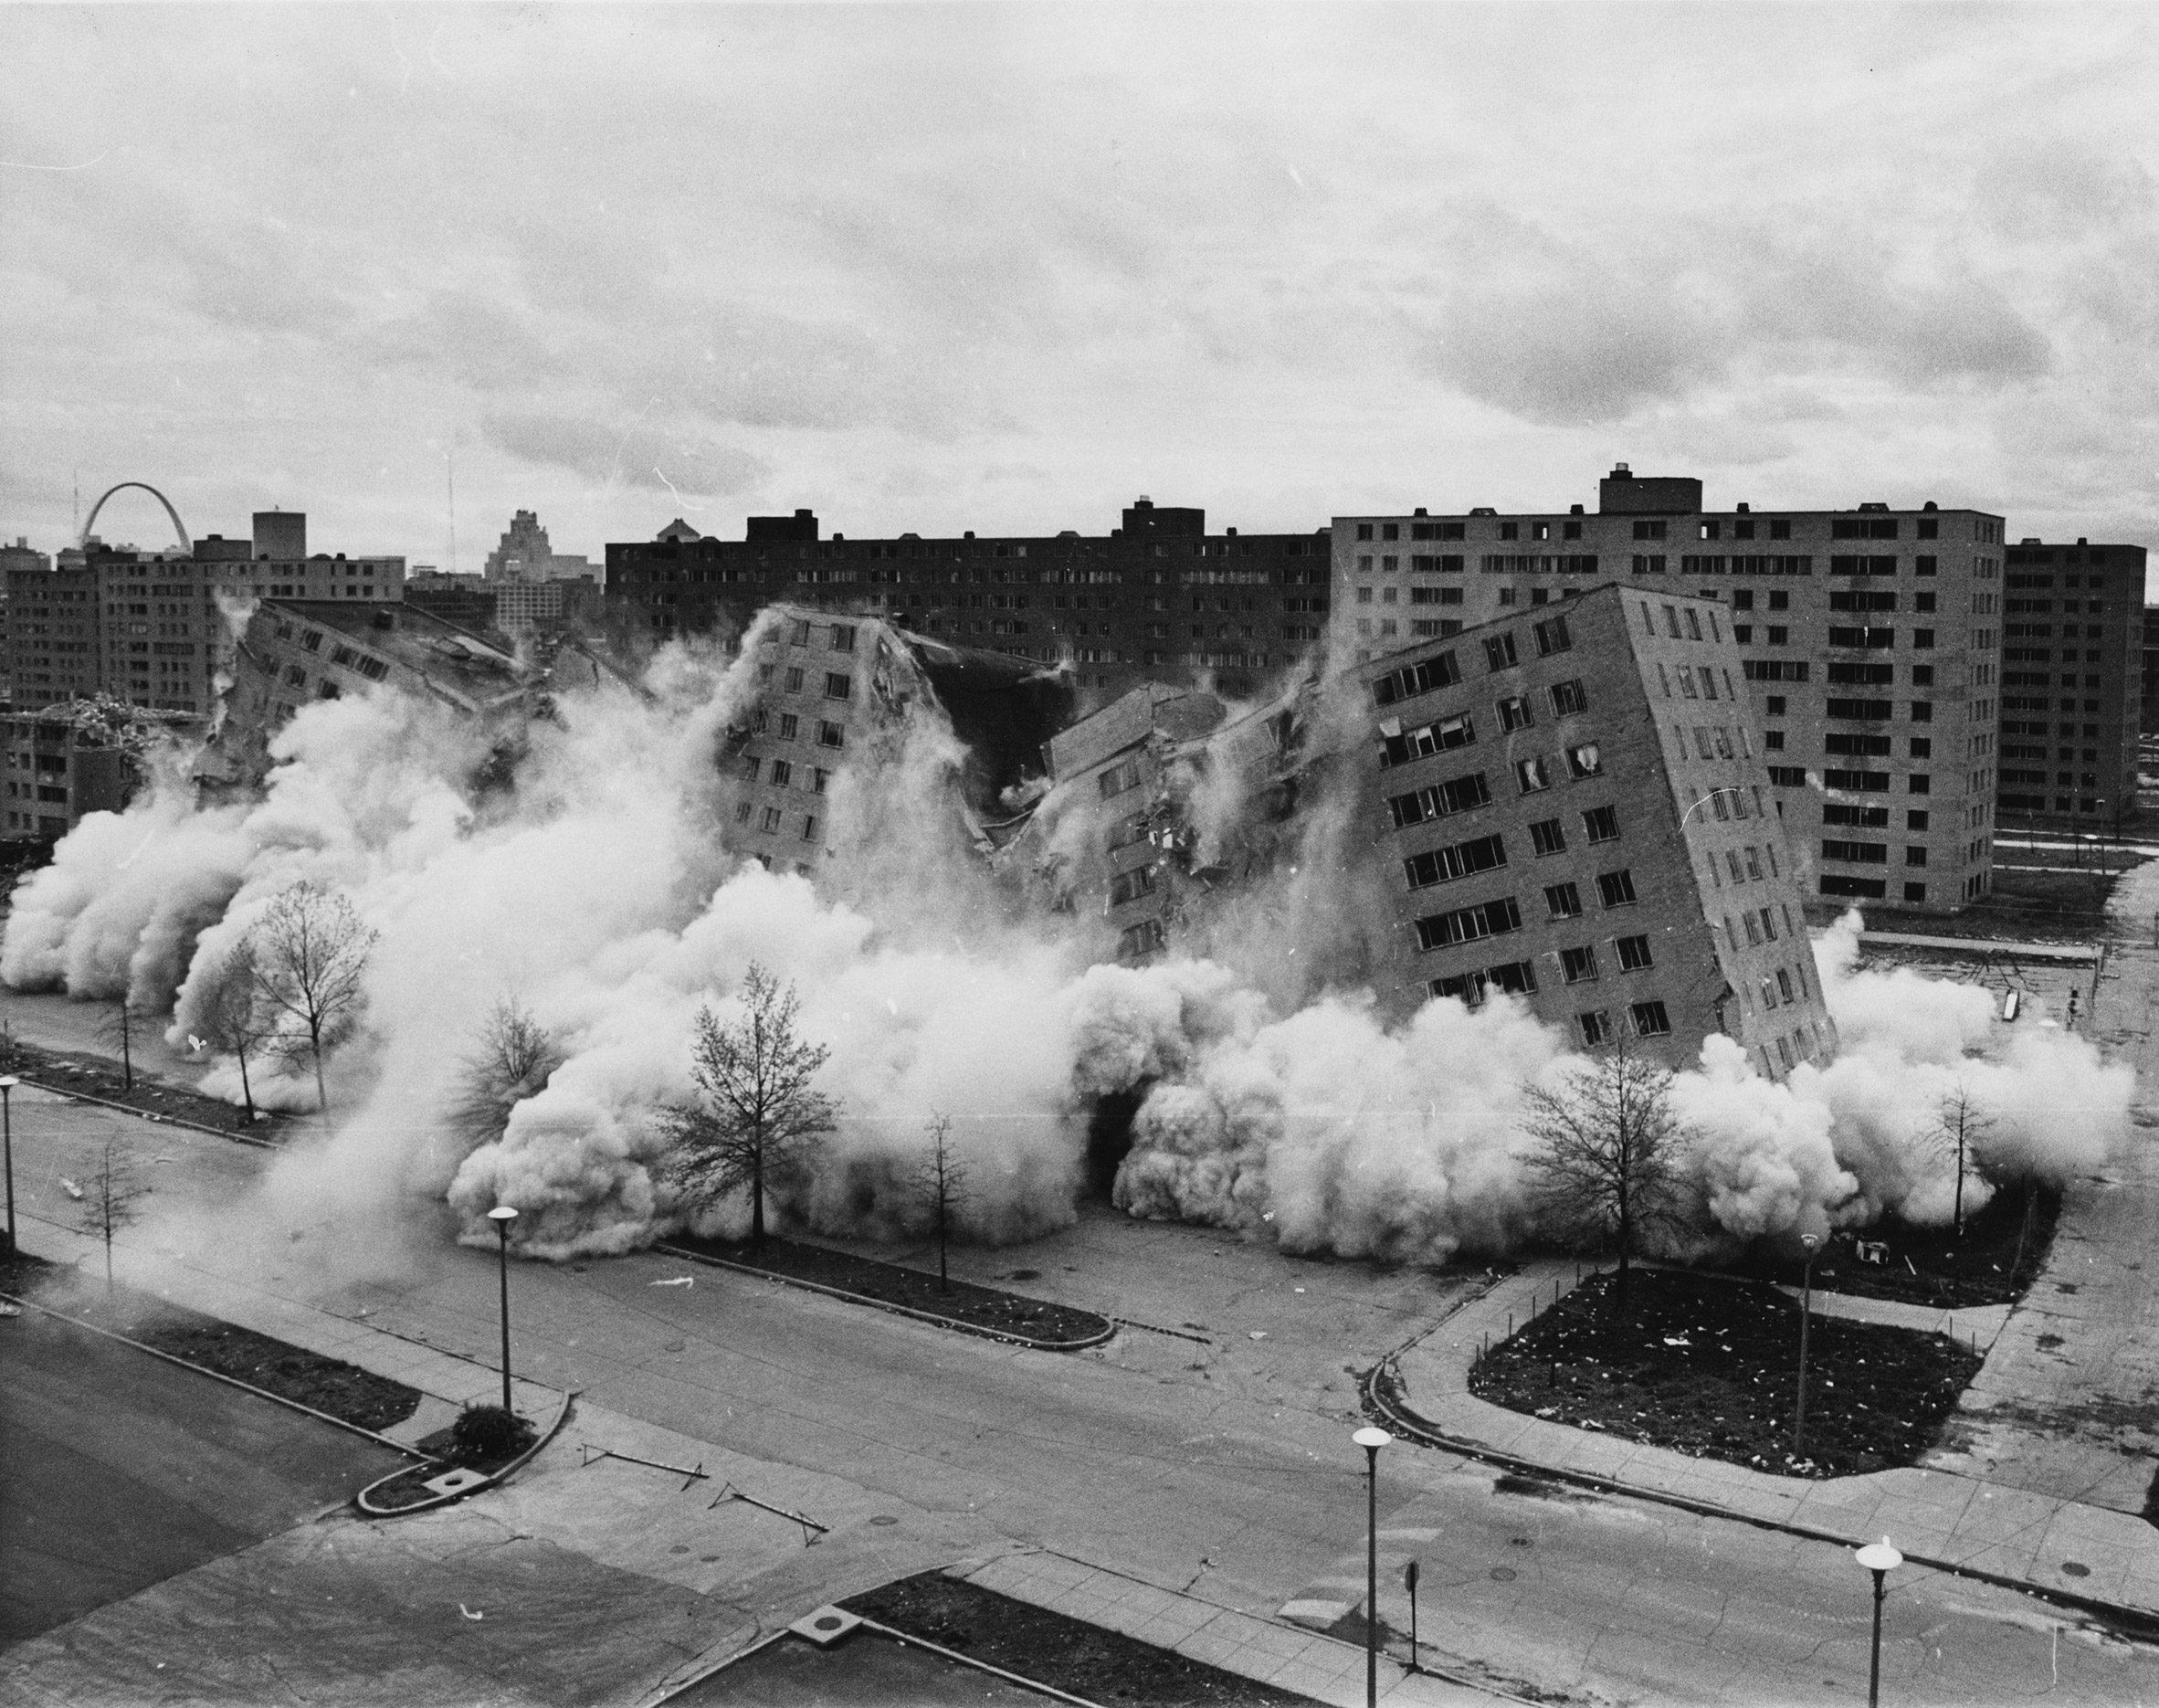 The demolition of Pruitt-Igoe in Missouri